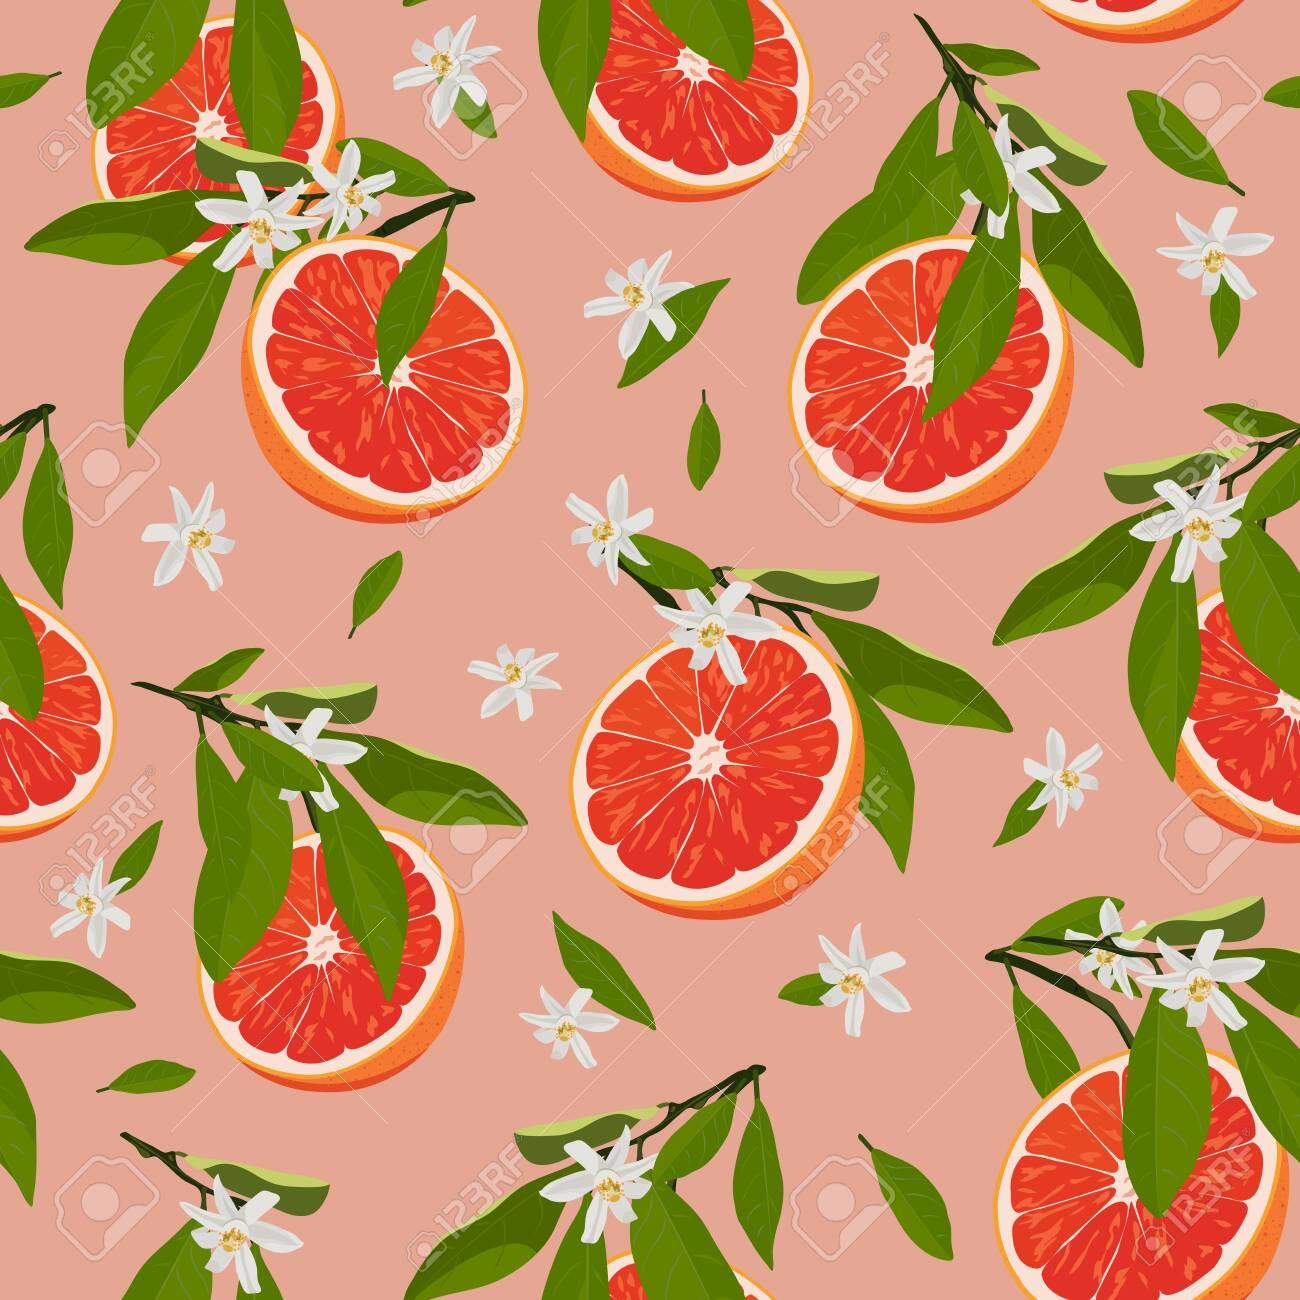 Orange fruits slice seamless pattern with flowers and leaves on rose pink background. Grapefruit citrus fruit vector illustration. - 128279513